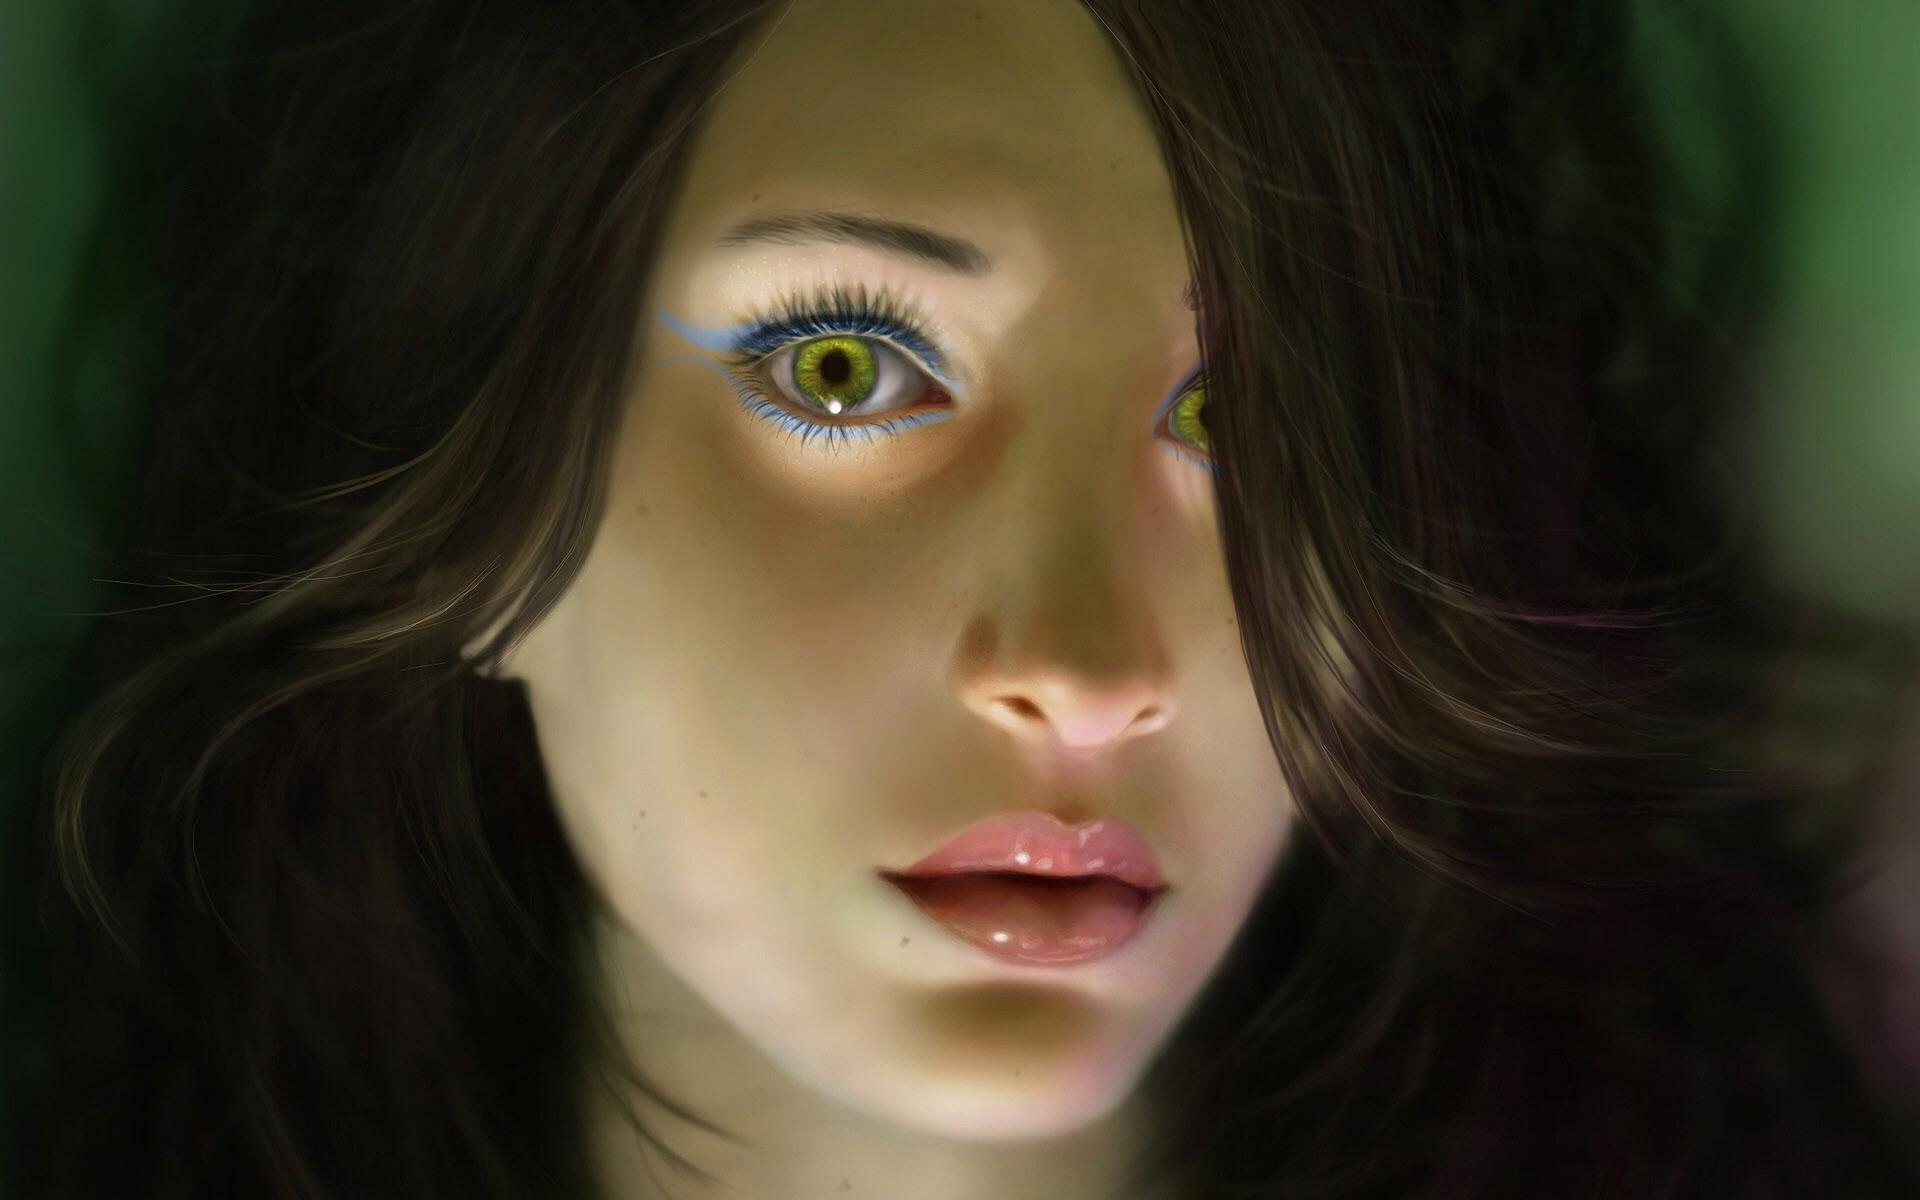 4 фото 1 слово девушка с глазом